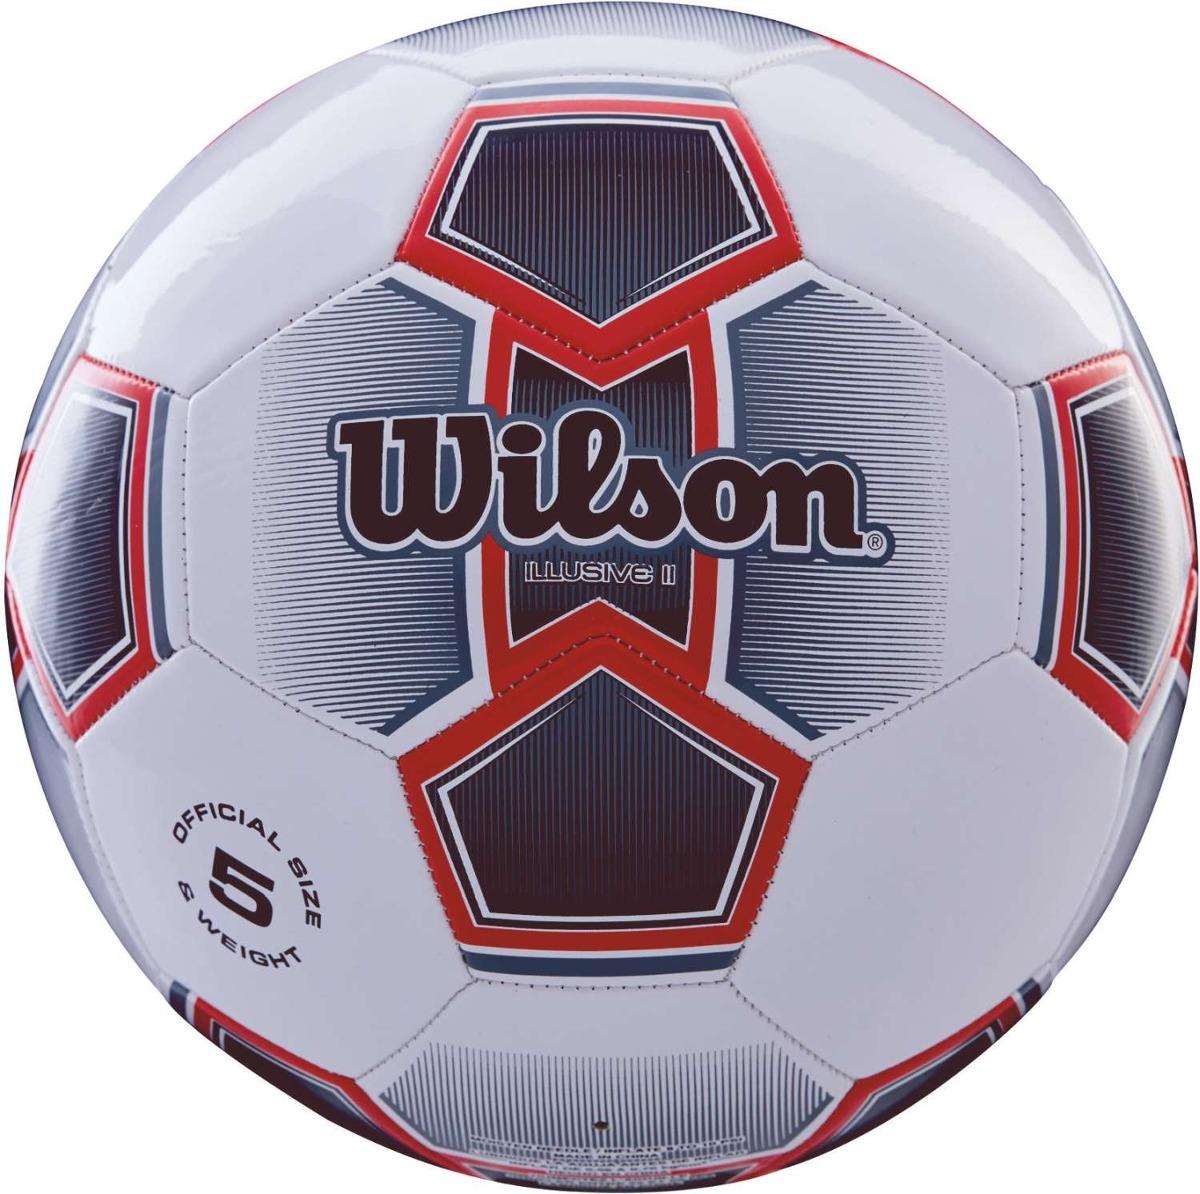 05846f90a0ba6 Bola De Futebol De Campo Illusive Ii N.5 Vermelha - R  90